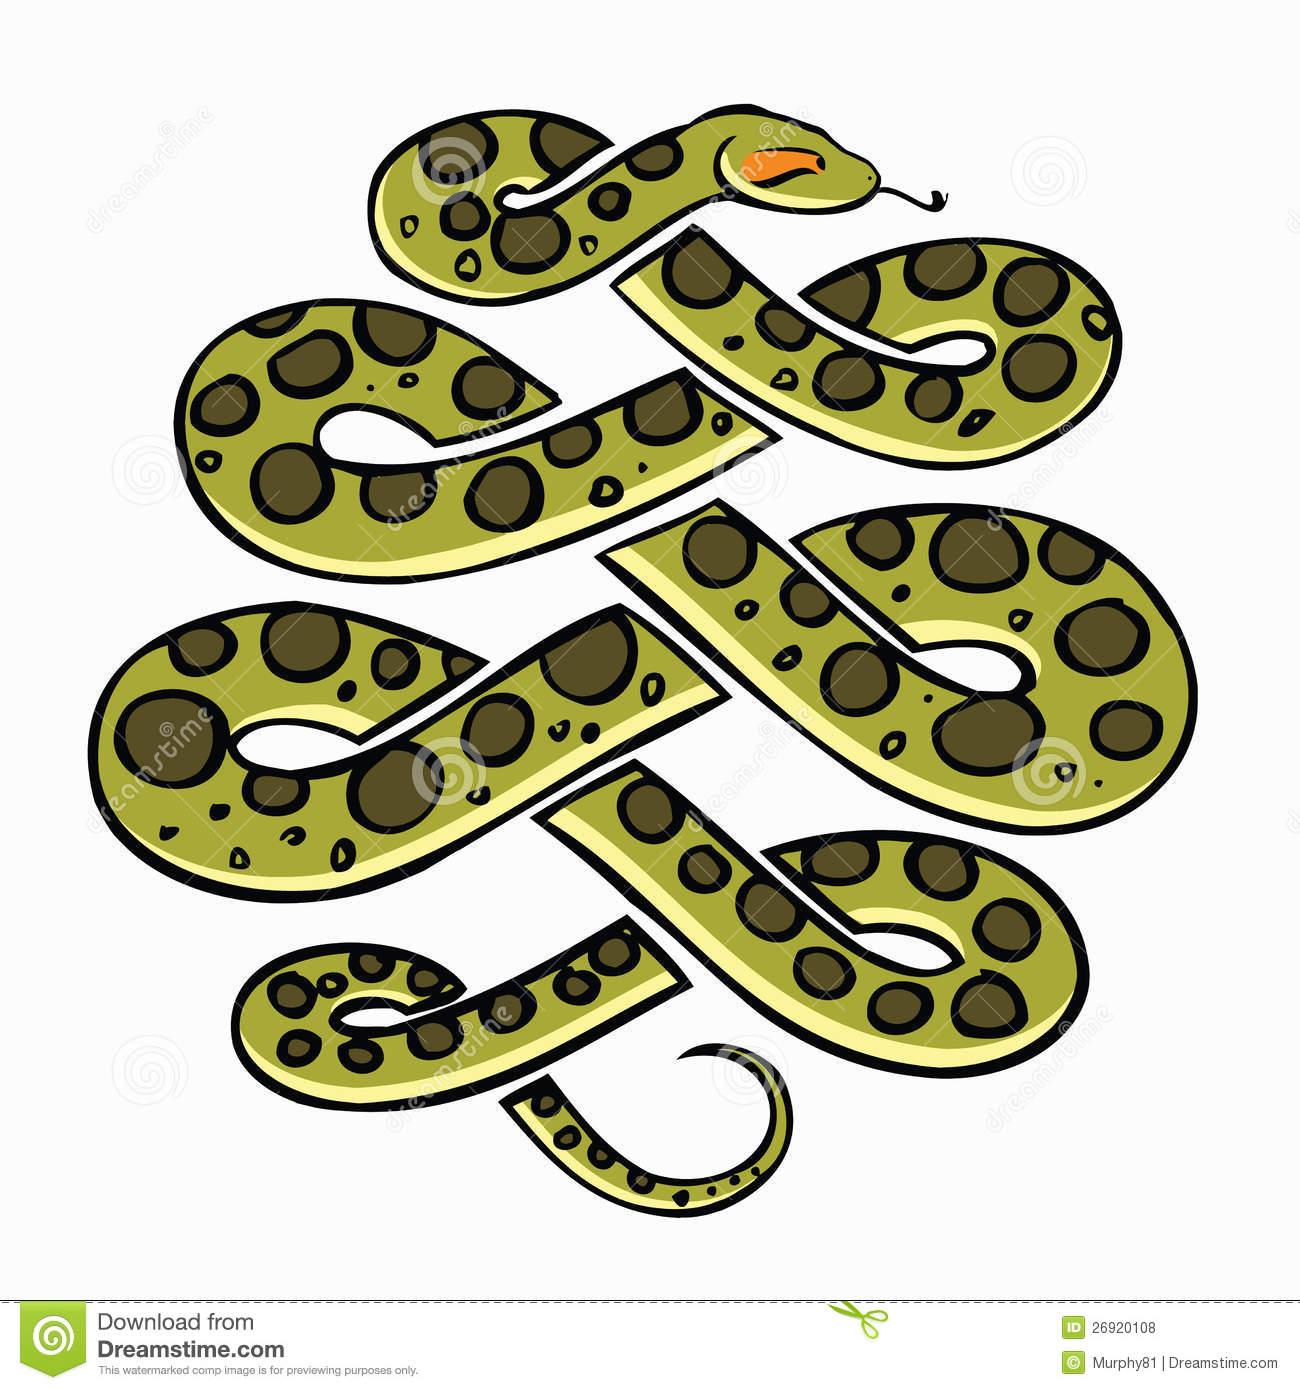 Anaconda clipart #17, Download drawings